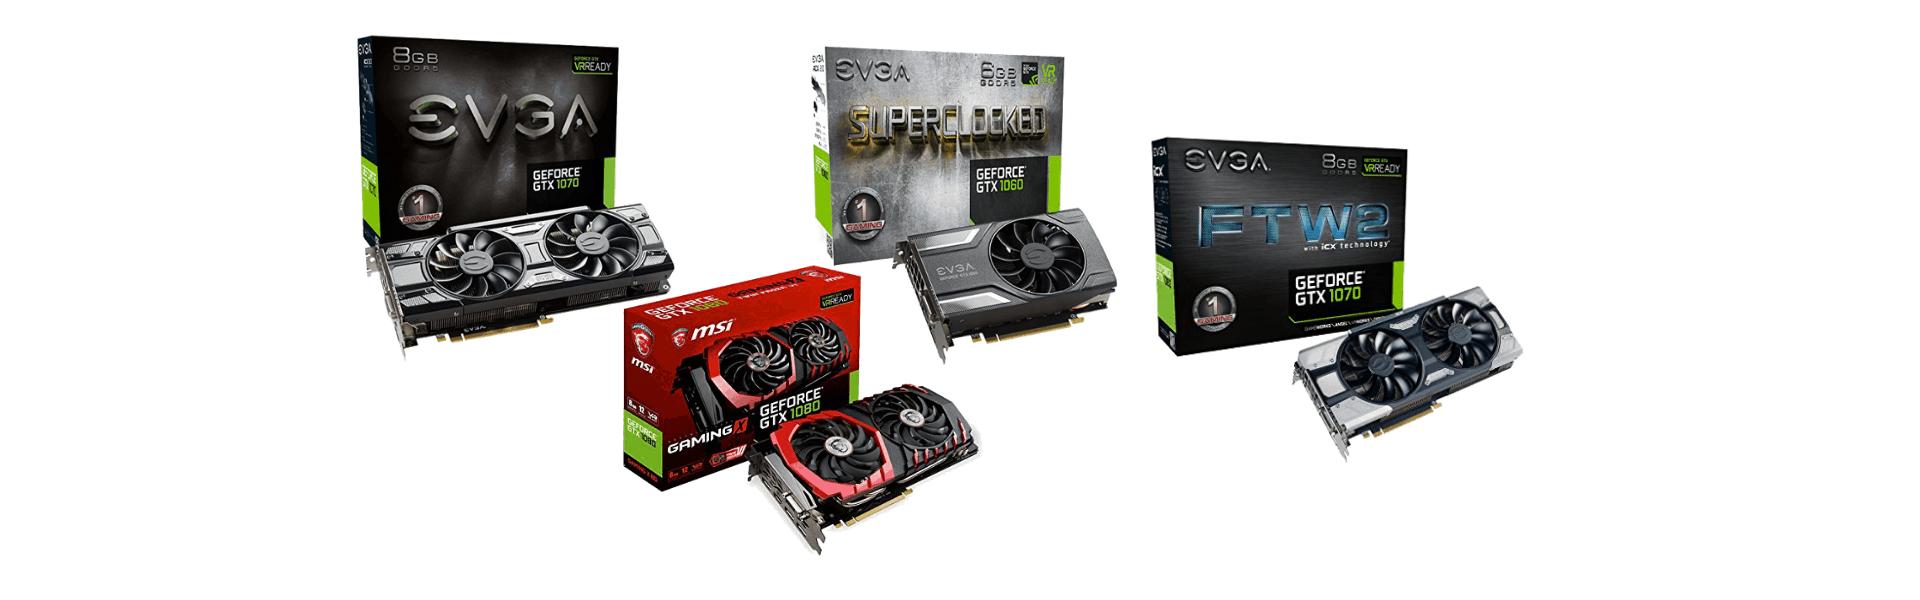 Fortnite Battle Royale on the Nvidia GT 1030 graphics card: PC 1080p, Intel i5 2400 - YouTube